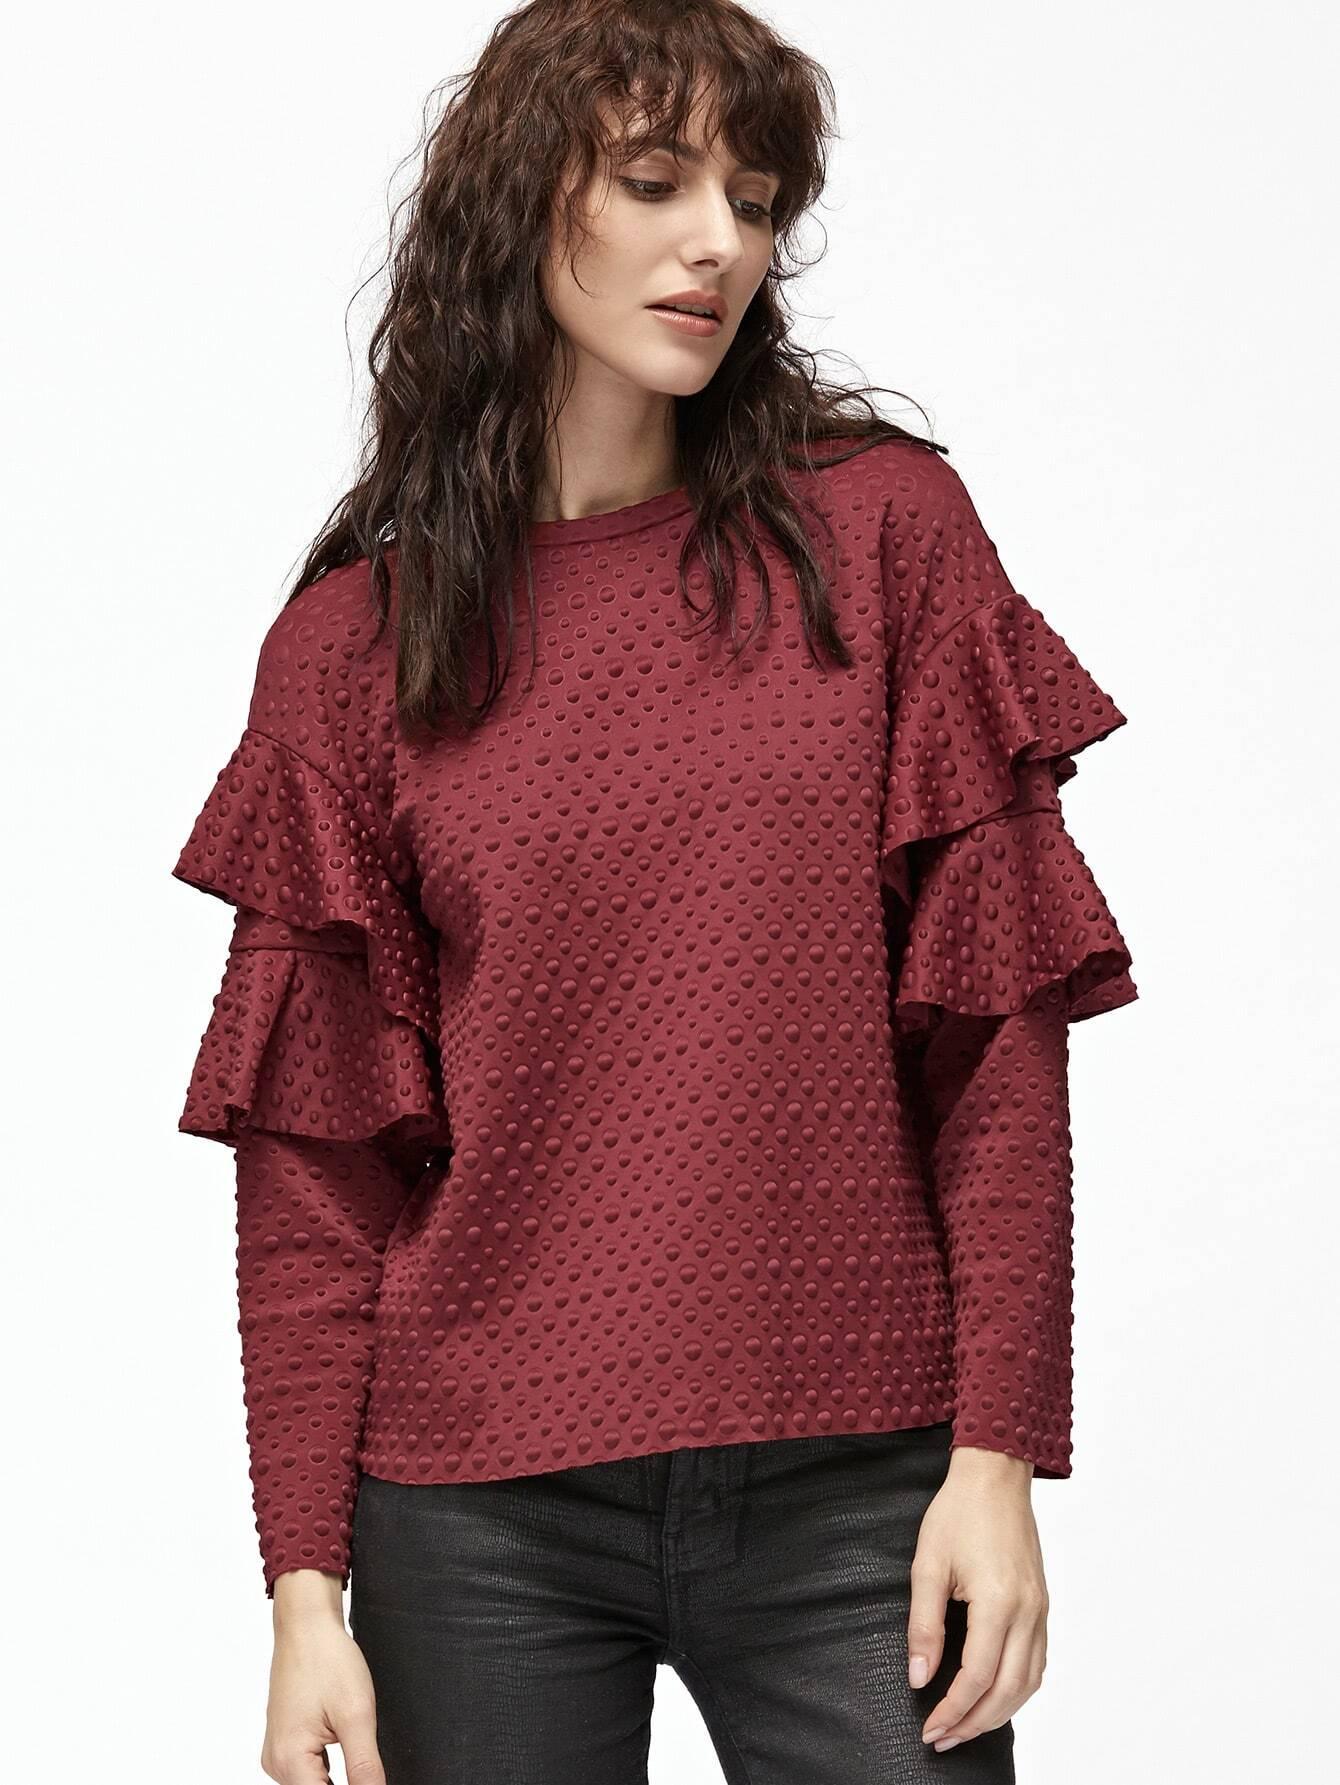 blouse161125705_2